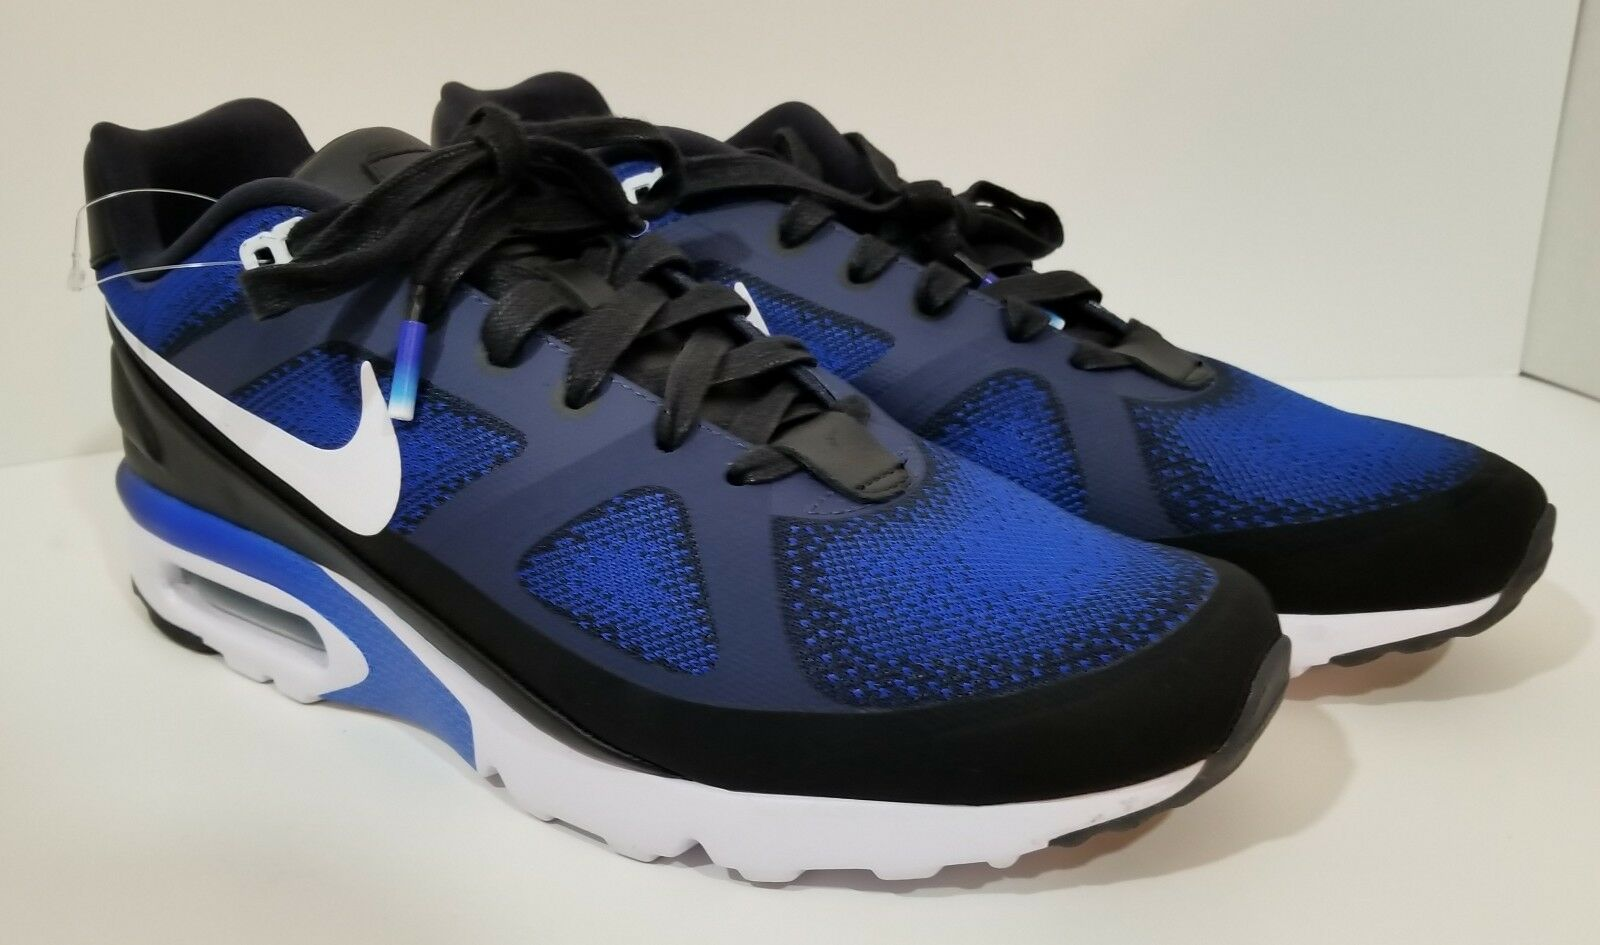 ab362d8b4ac4 ... Nike Air Max MP MP MP Ultra Mark Parker Mens Running Shoes Blue Black  Size 11 ...